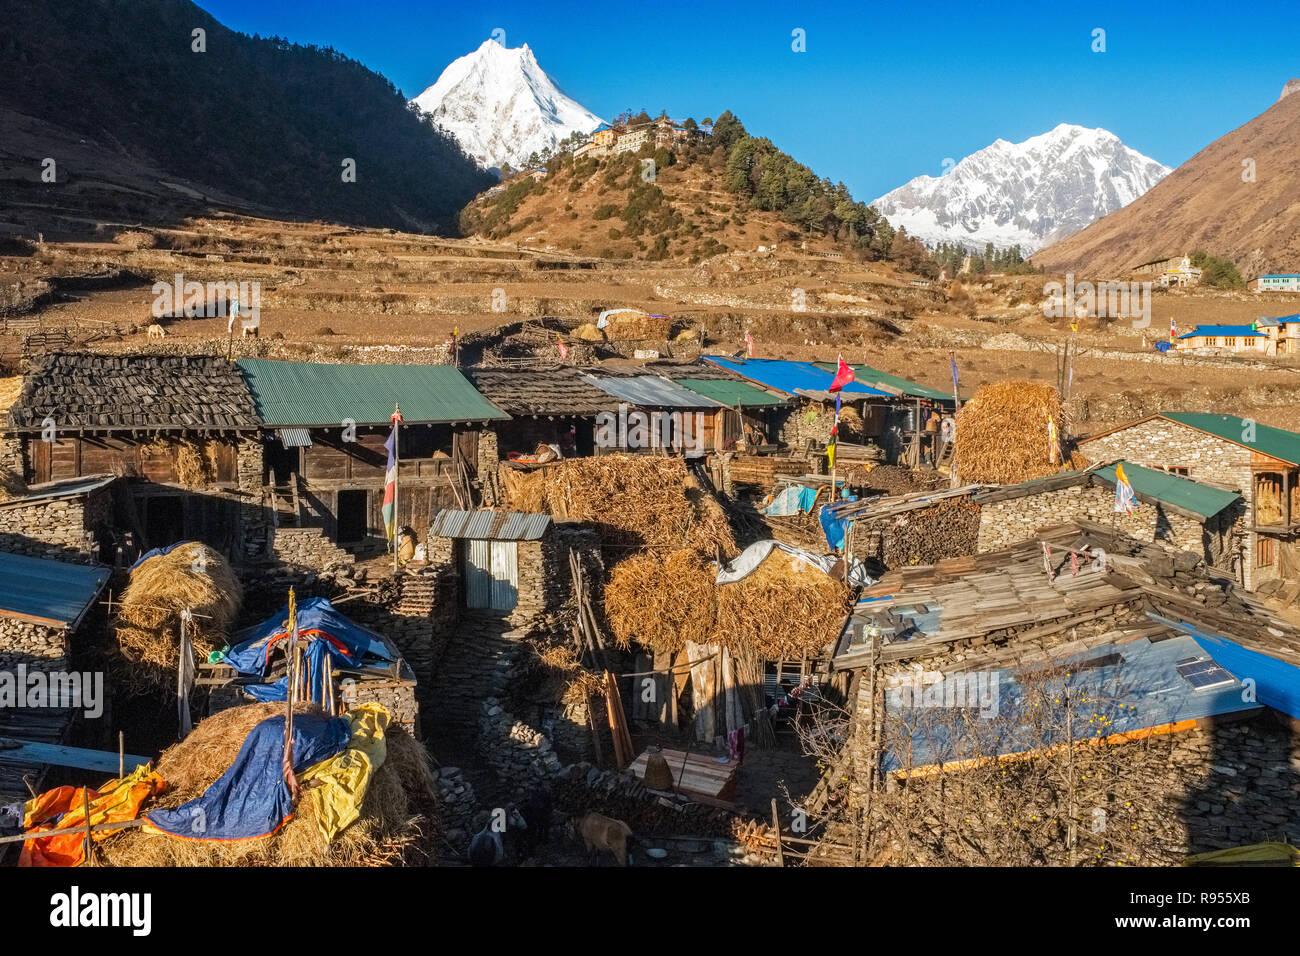 The ethnically Tibetan village of Lho in the Manaslu region of the Nepal Himalayas lies on the Manaslu Circuit trekking route. Manaslu peak beyond - Stock Image